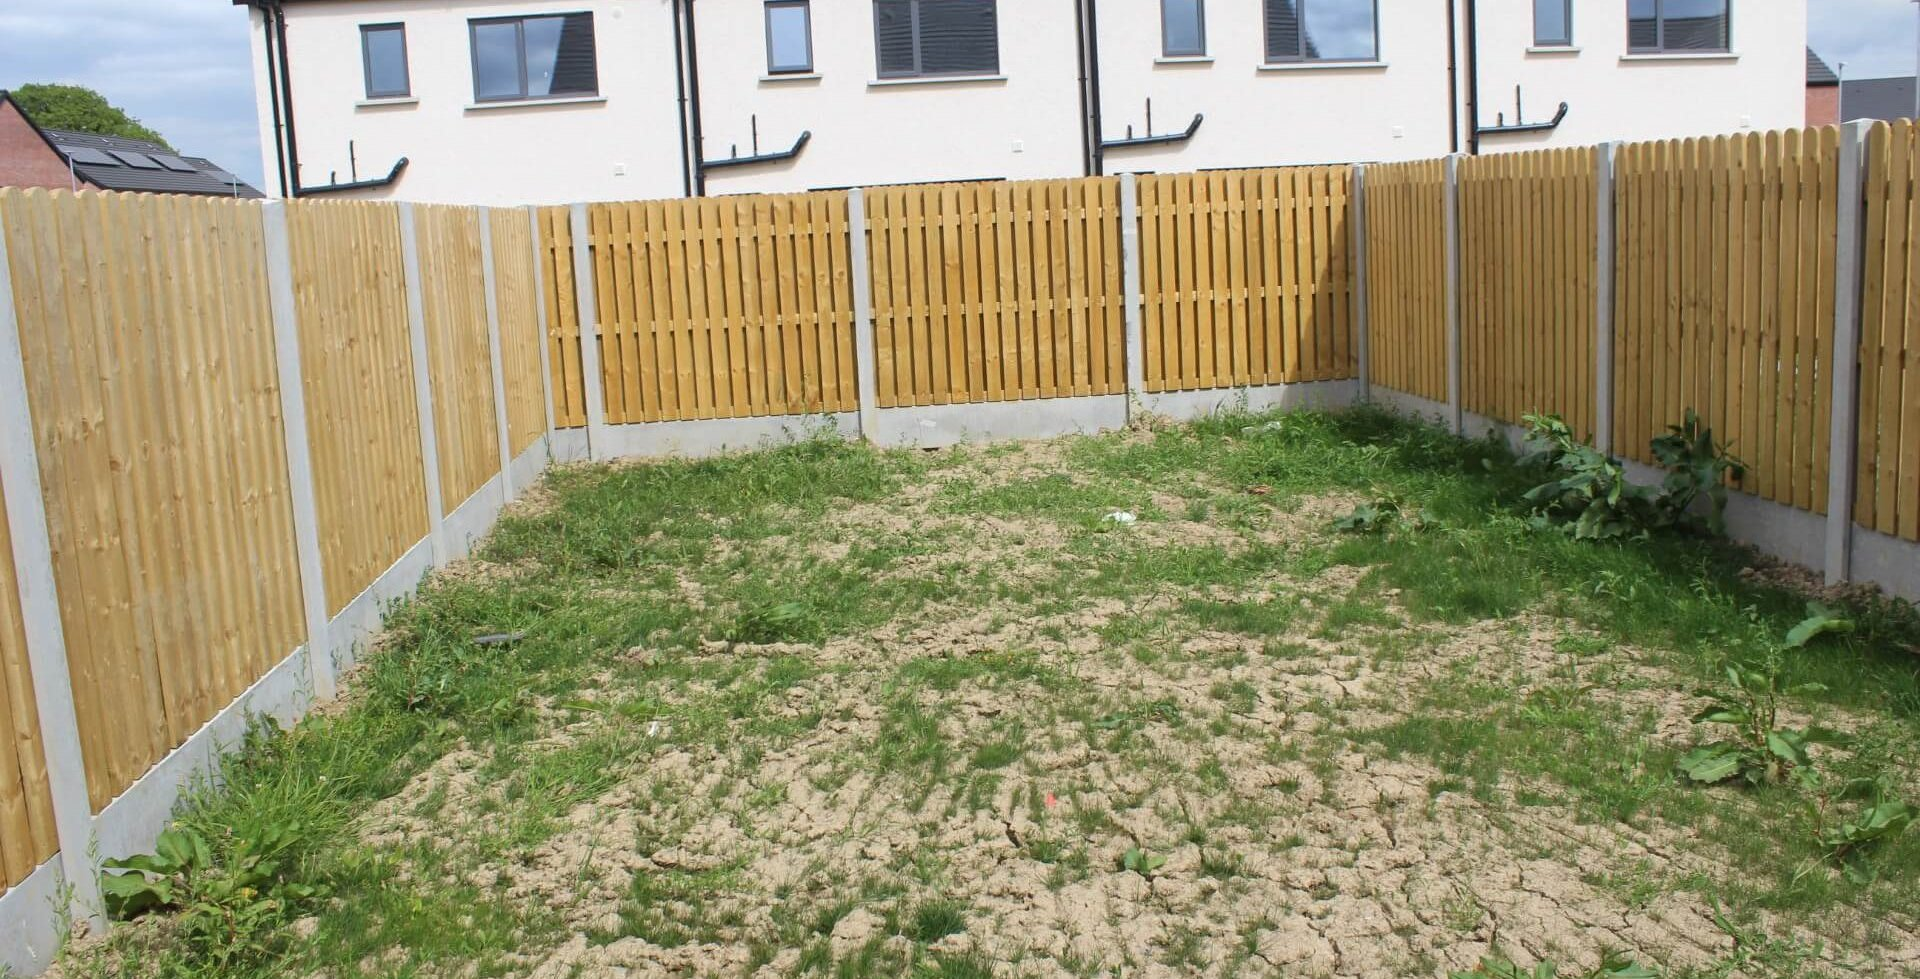 Housing Development Fence